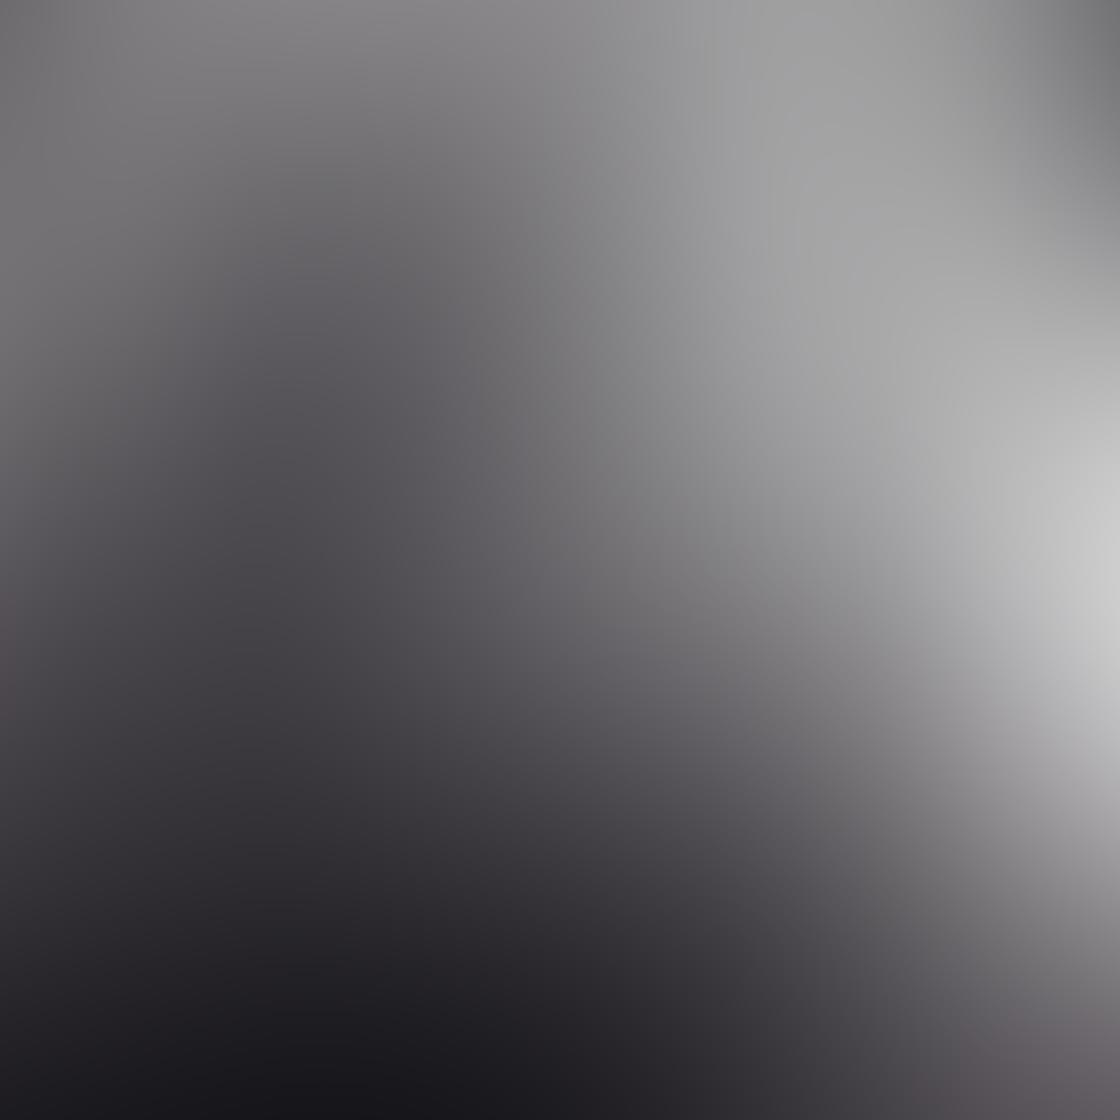 iPhone Photos Low Angle 3